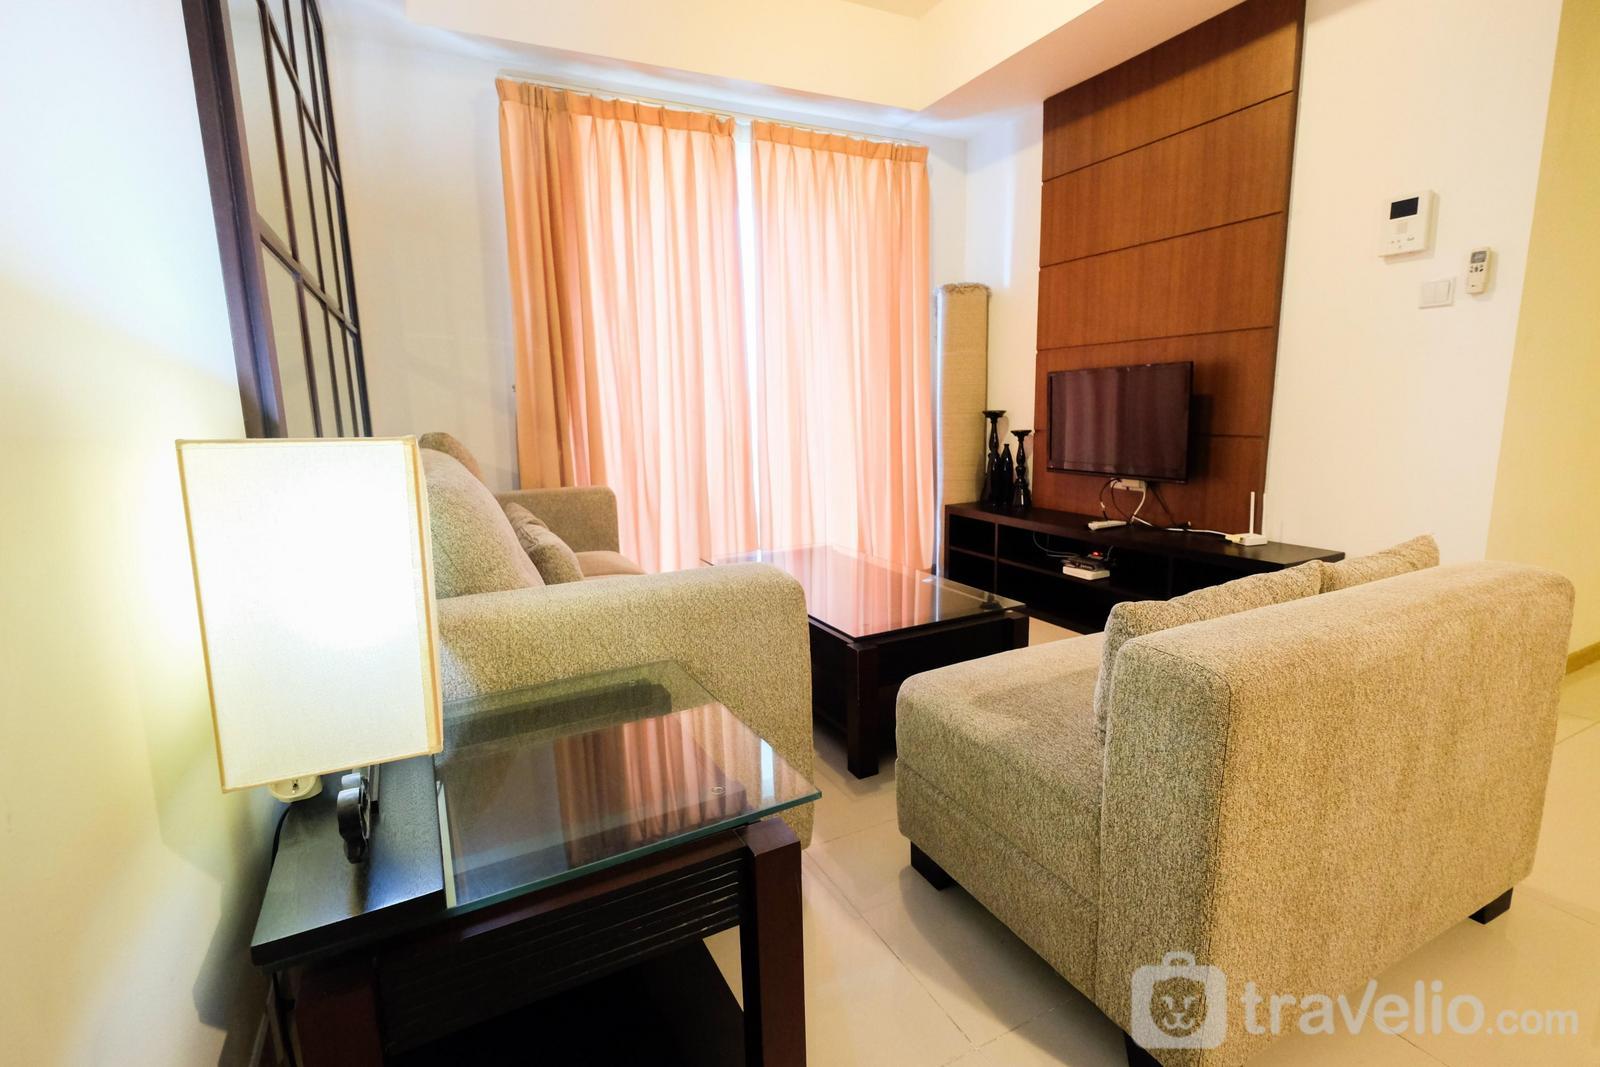 Casa Grande Residence - Homey 2BR Apartment @ Casa Grande Residence By Travelio